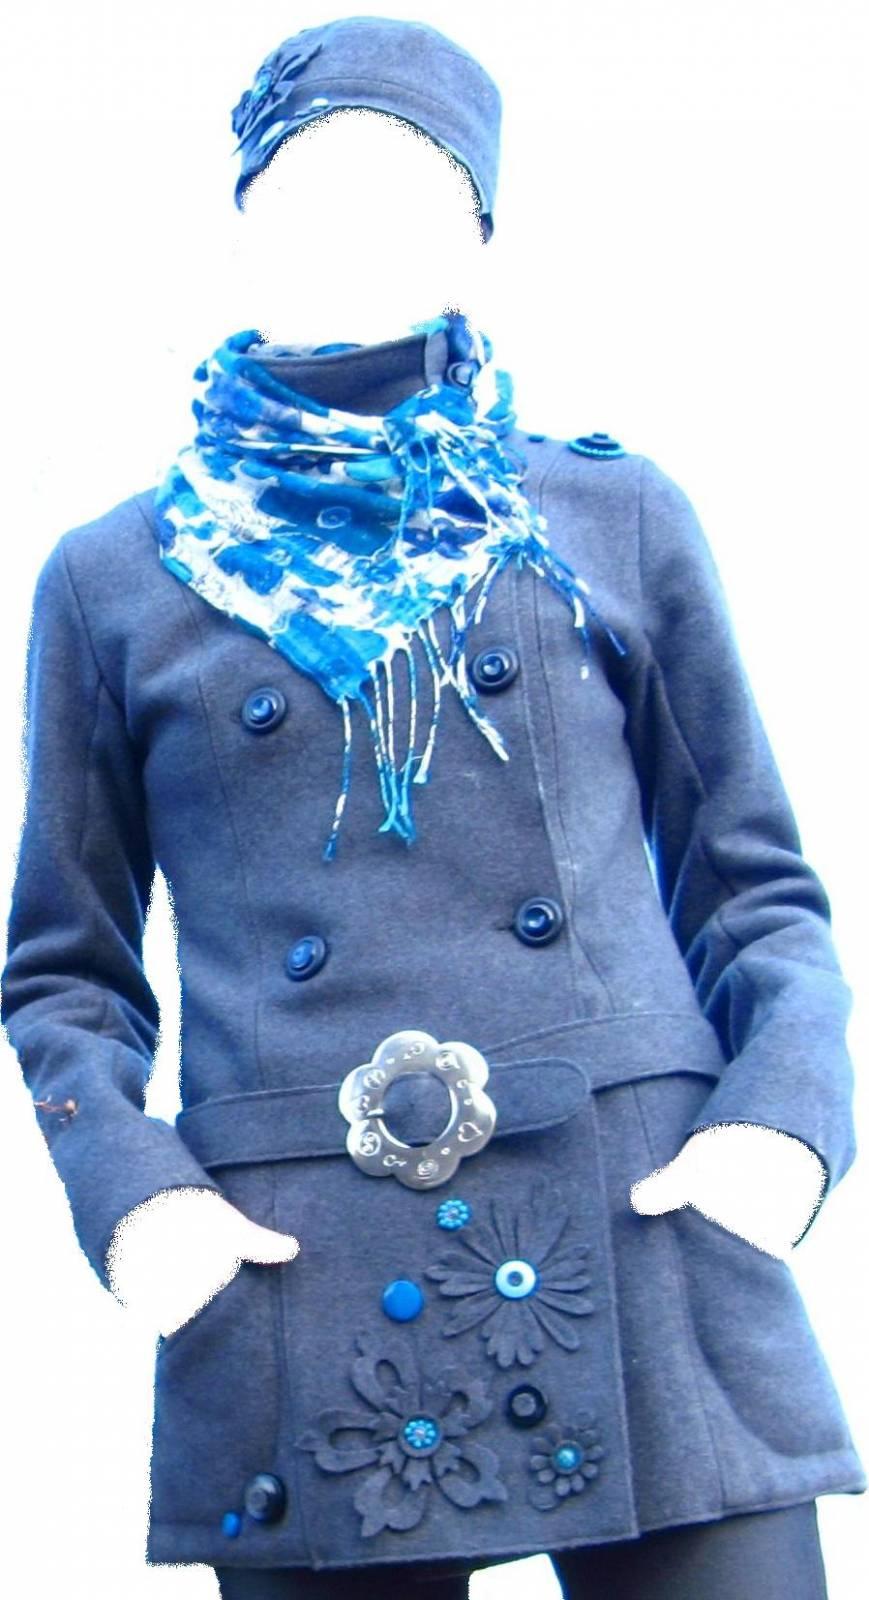 Цветок из драпа на пальто своими руками